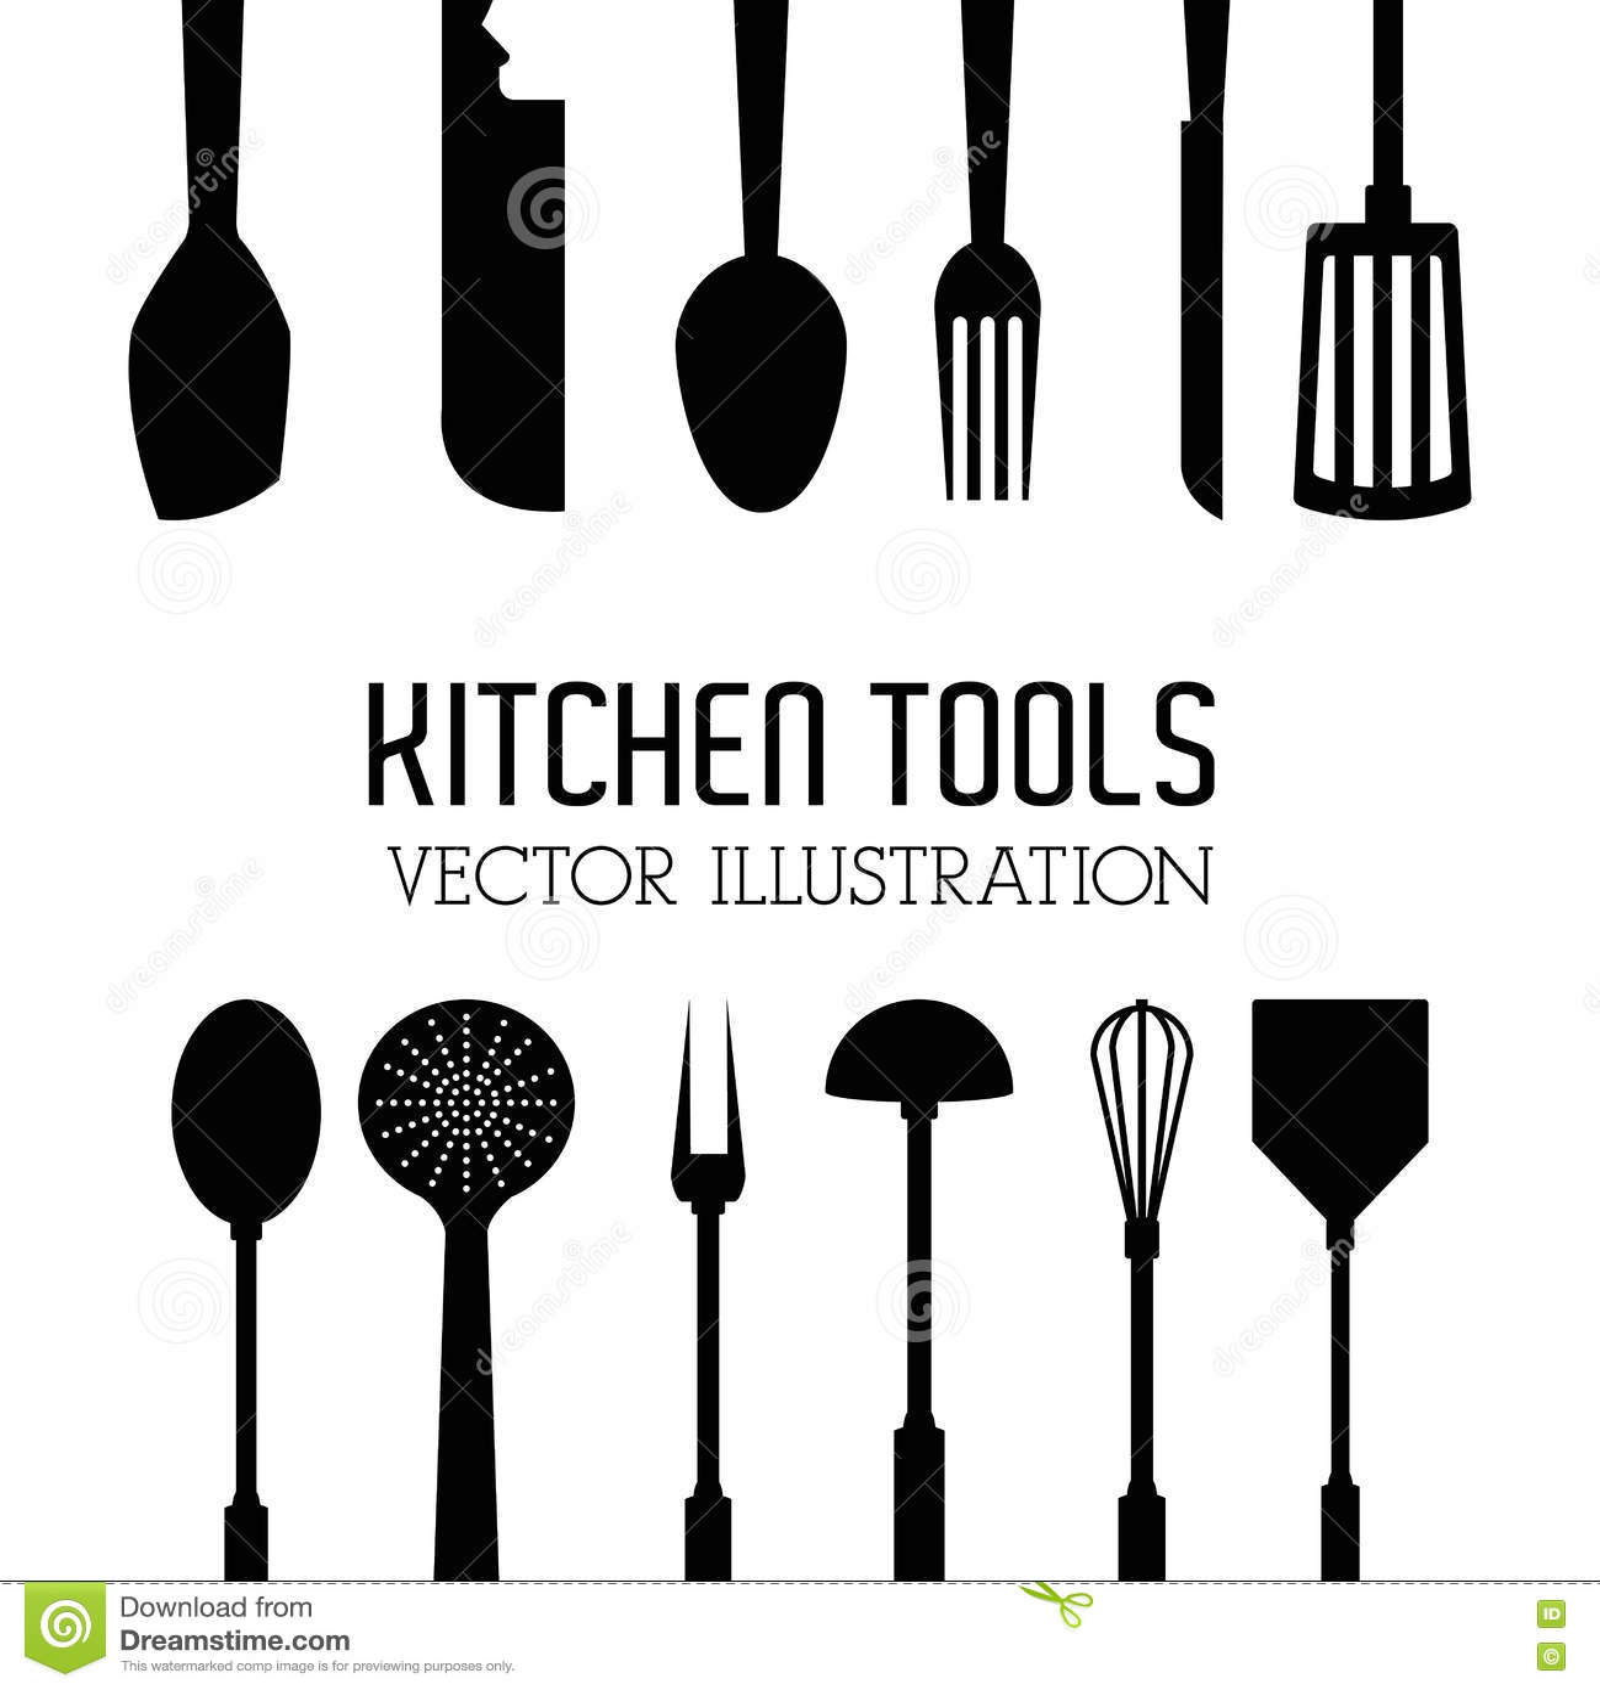 Illustration Of Kitchen Tools, Editable Vector Stock